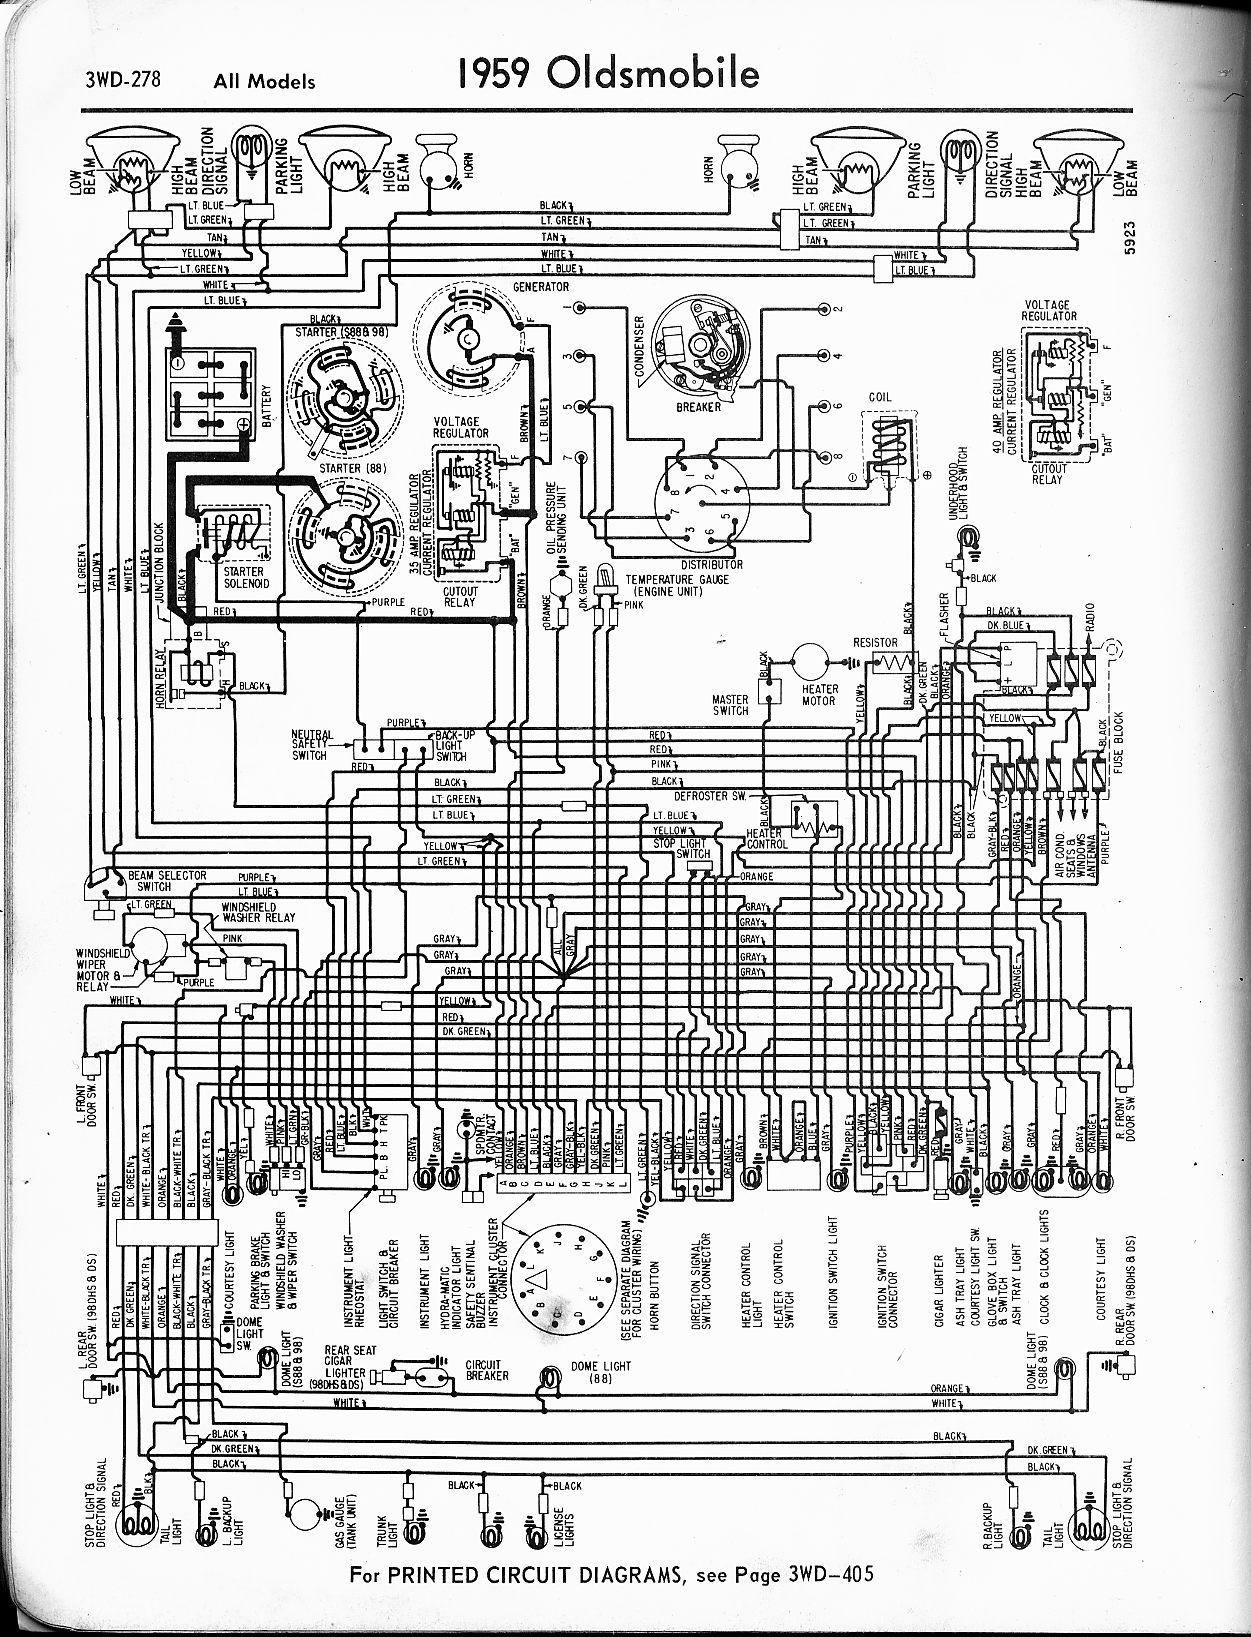 Peachy Olds Wiring Diagrams Wiring Diagram M6 Wiring Cloud Rineaidewilluminateatxorg